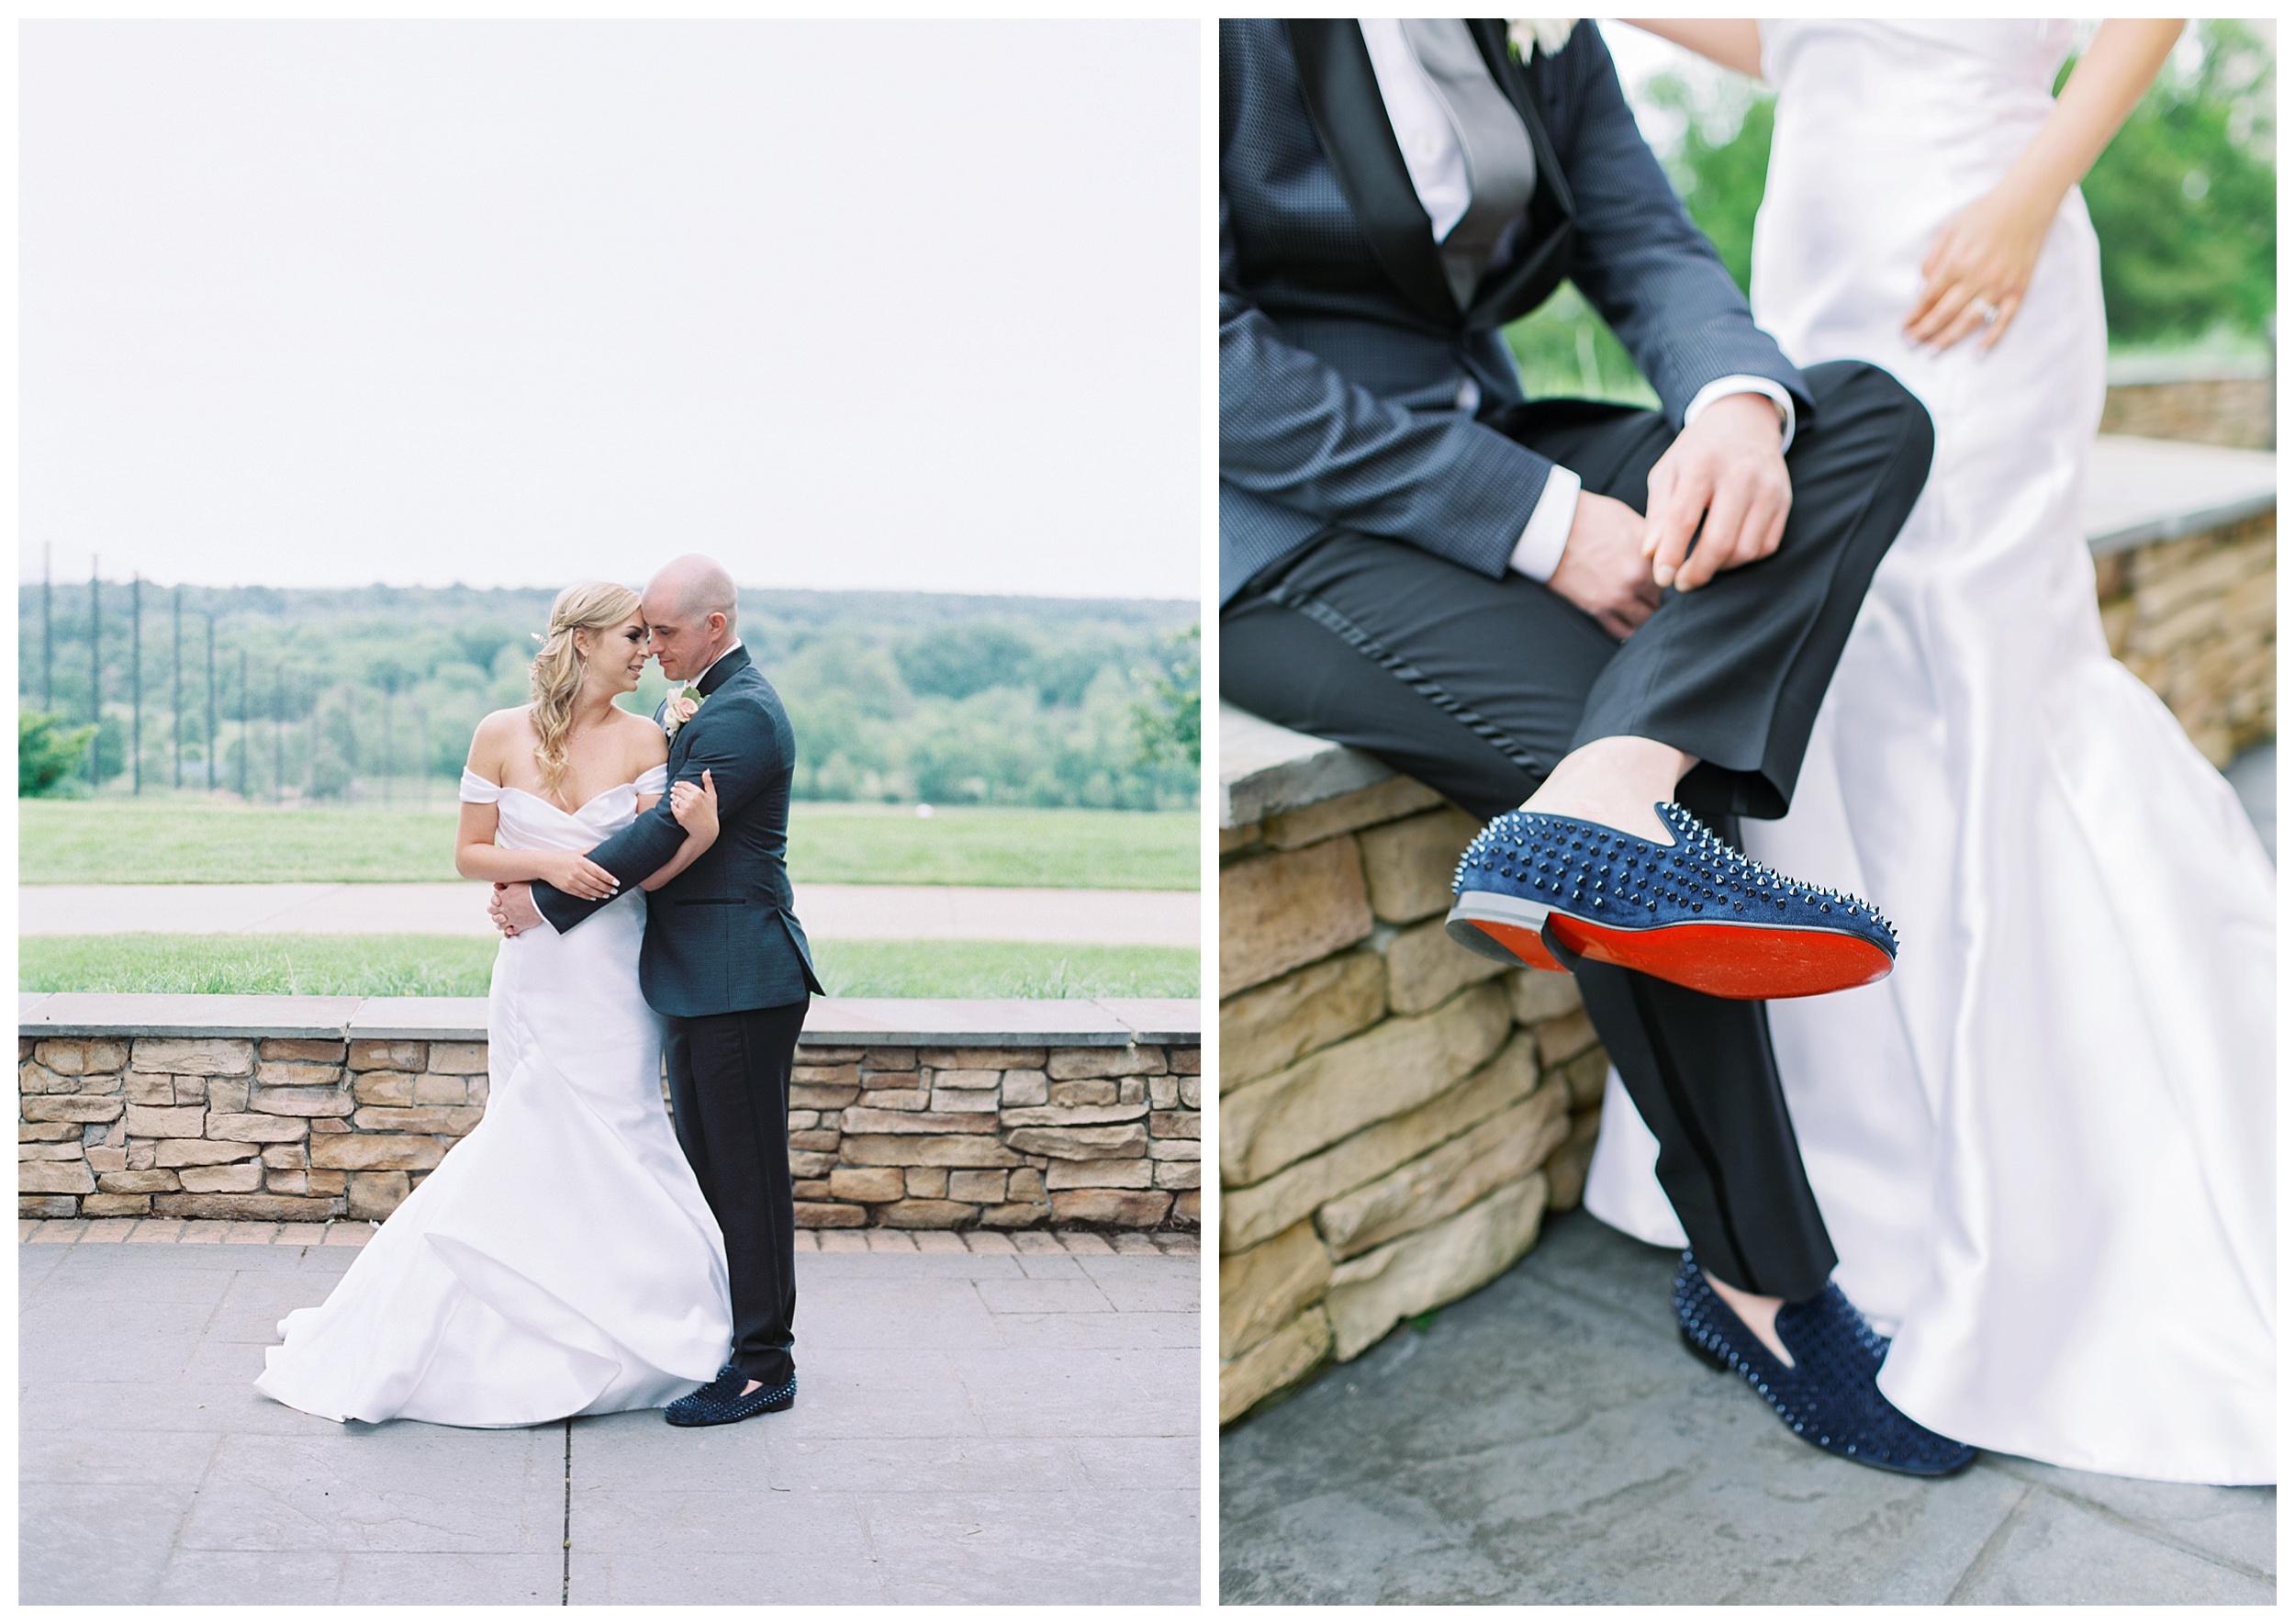 Lansdowne Resort Wedding | Virginia Film Wedding Photographer Kir Tuben_0042.jpg